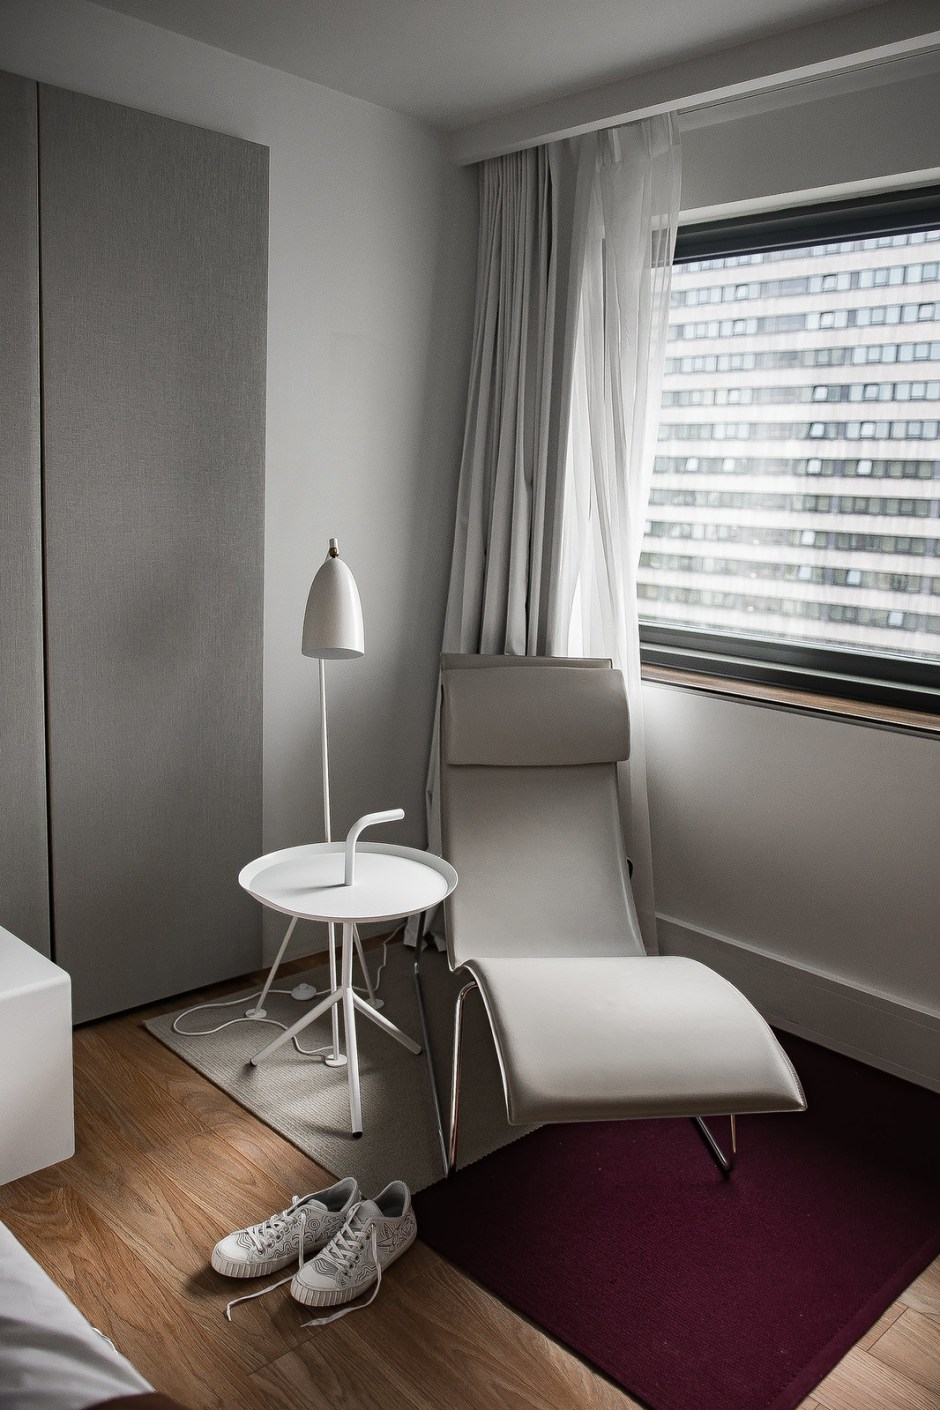 Philippe Model Paris Frankfurt Hotel Beige Renegade Bloggers Boyfriend-2